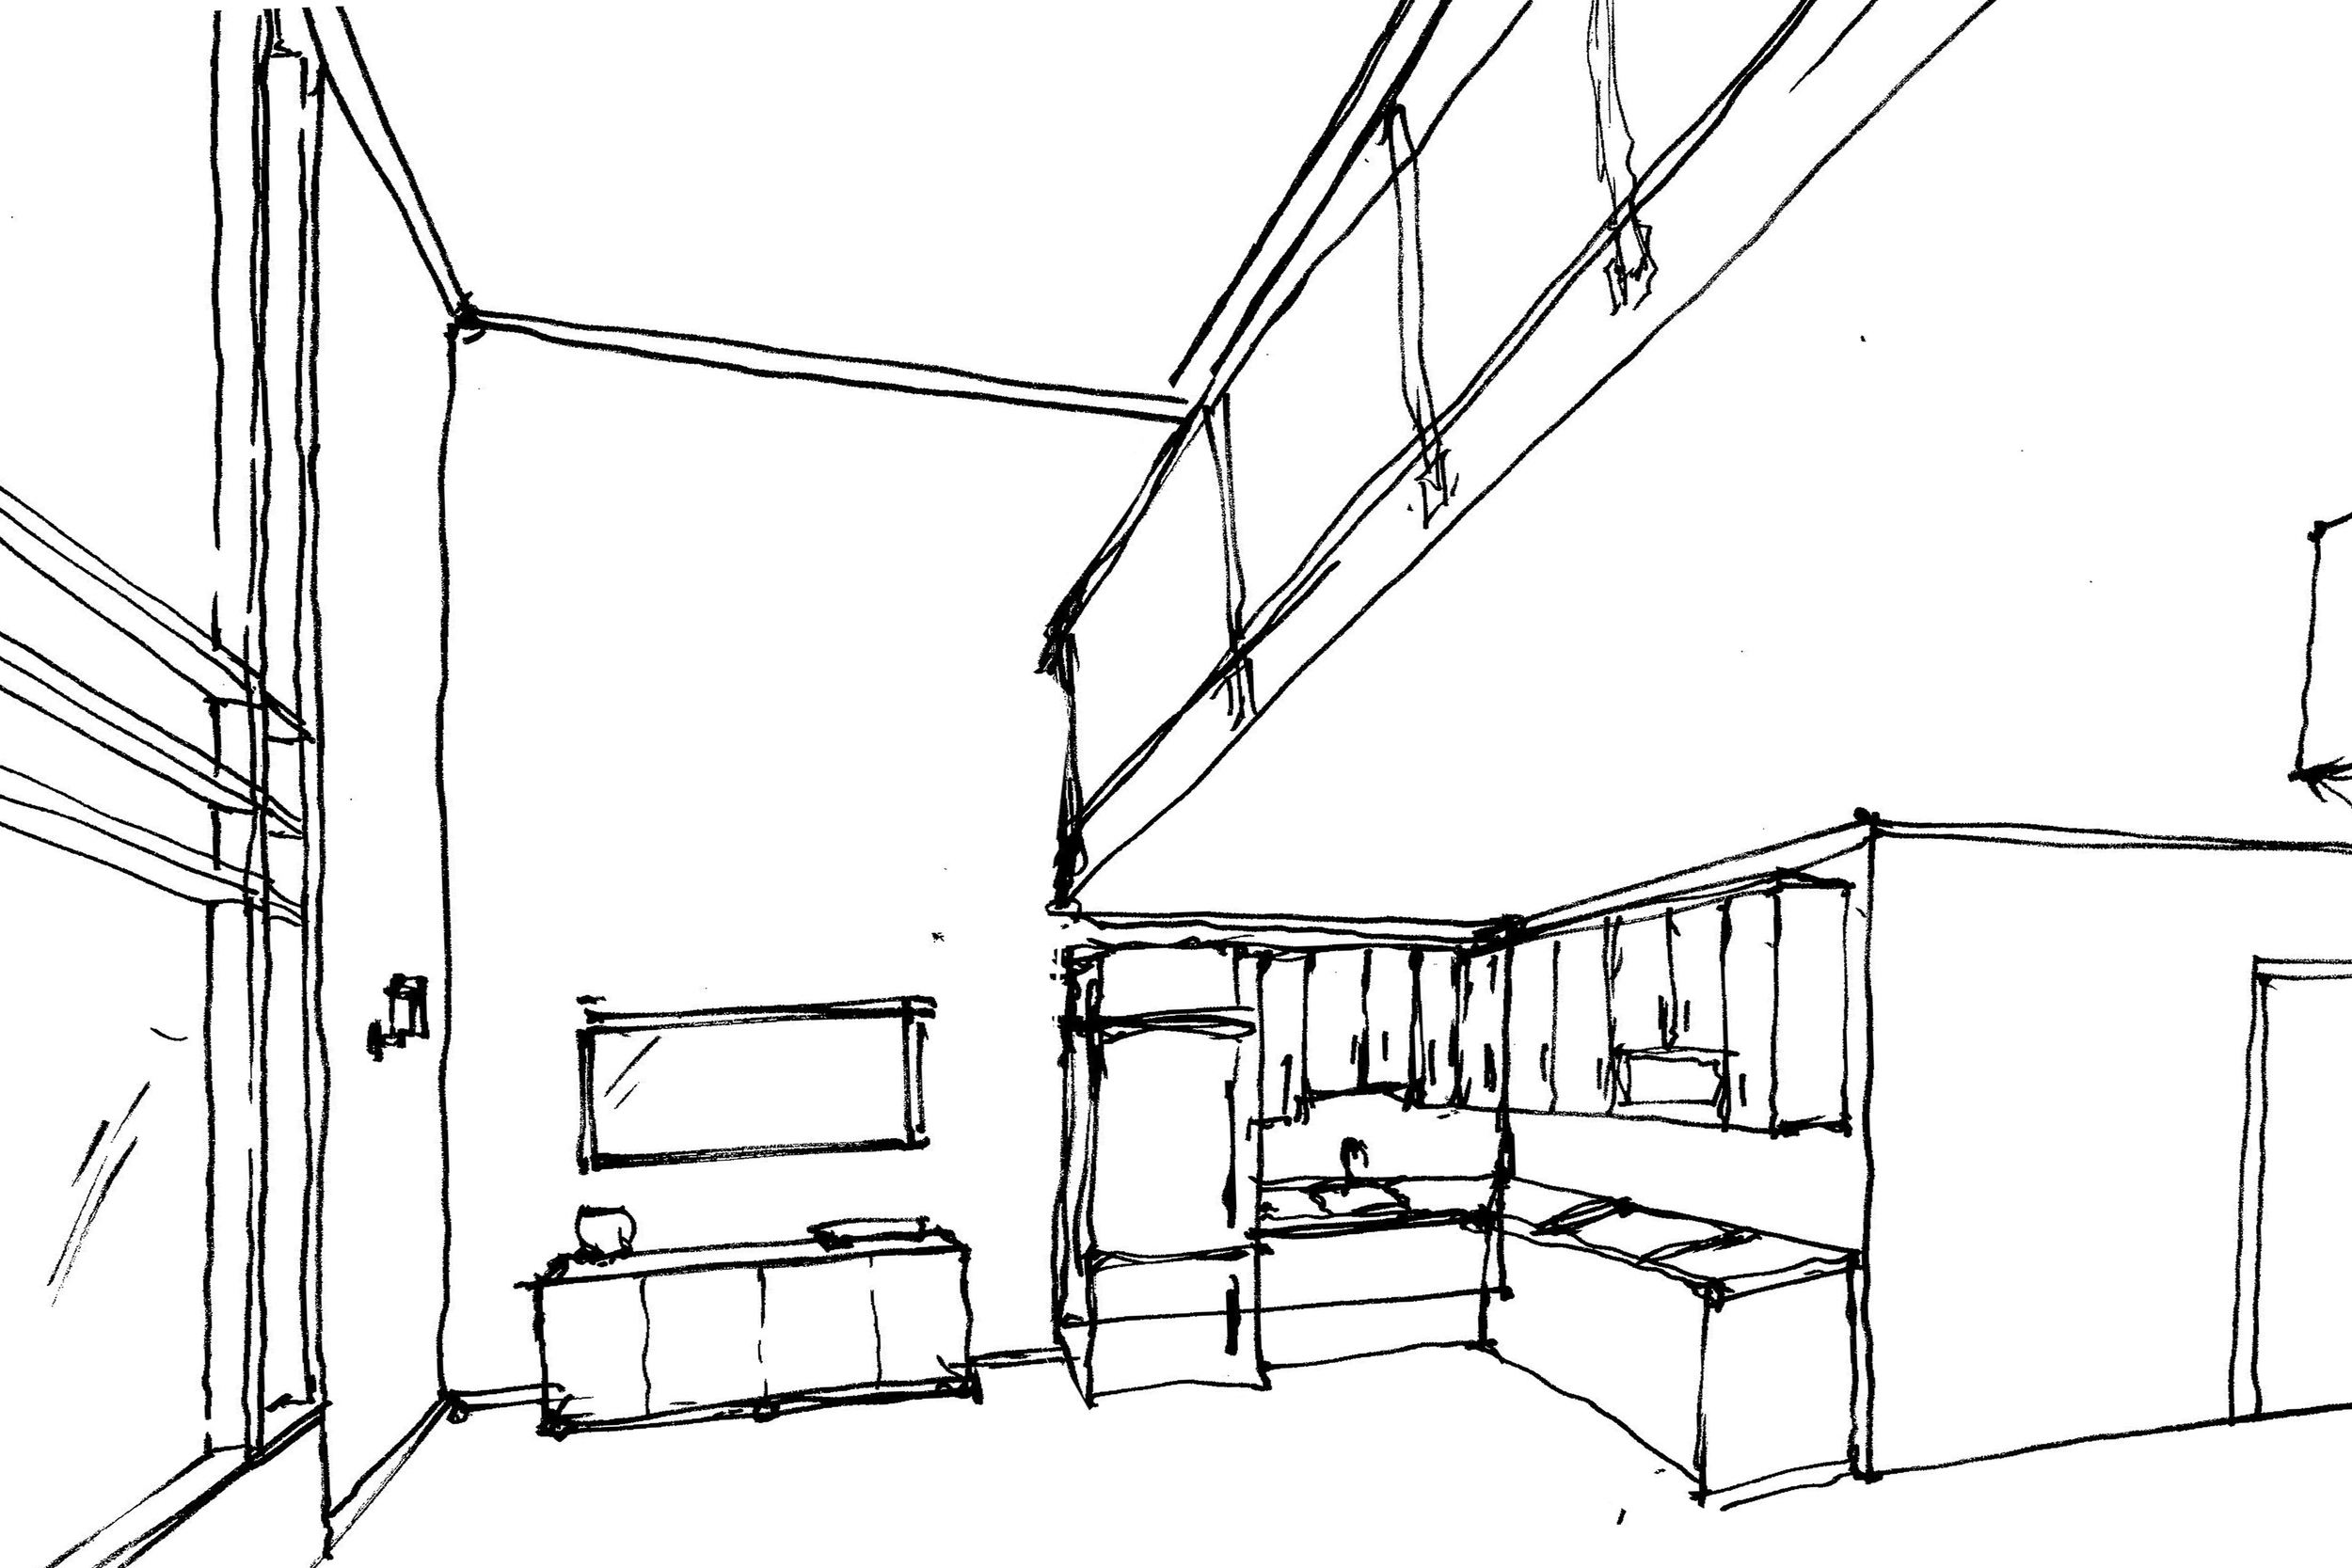 05 - Interior Sketch.jpg